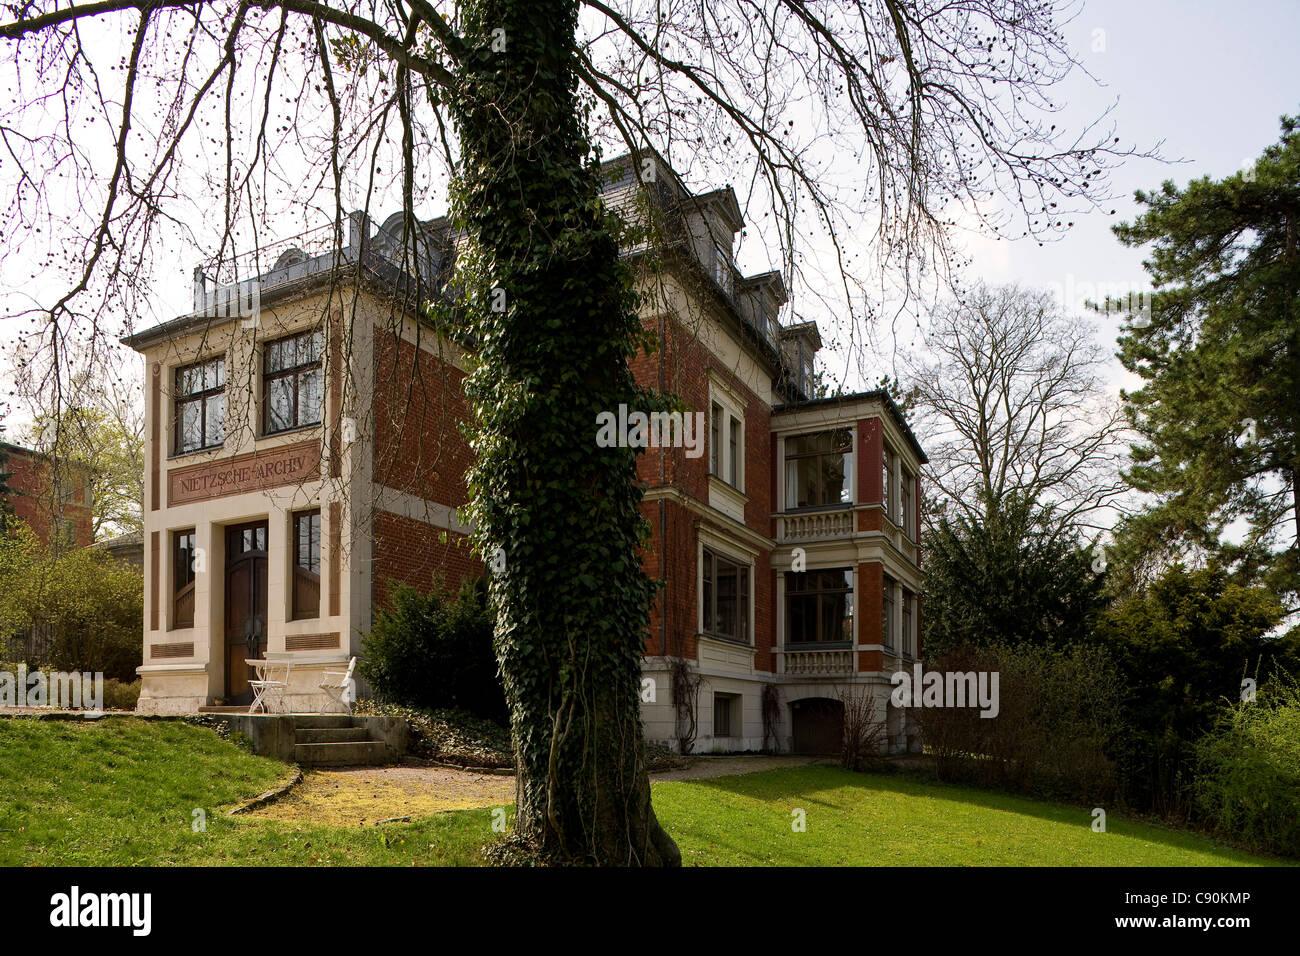 Archivio di Nietzsche, Weimar, Turingia, Germania, Europa Immagini Stock